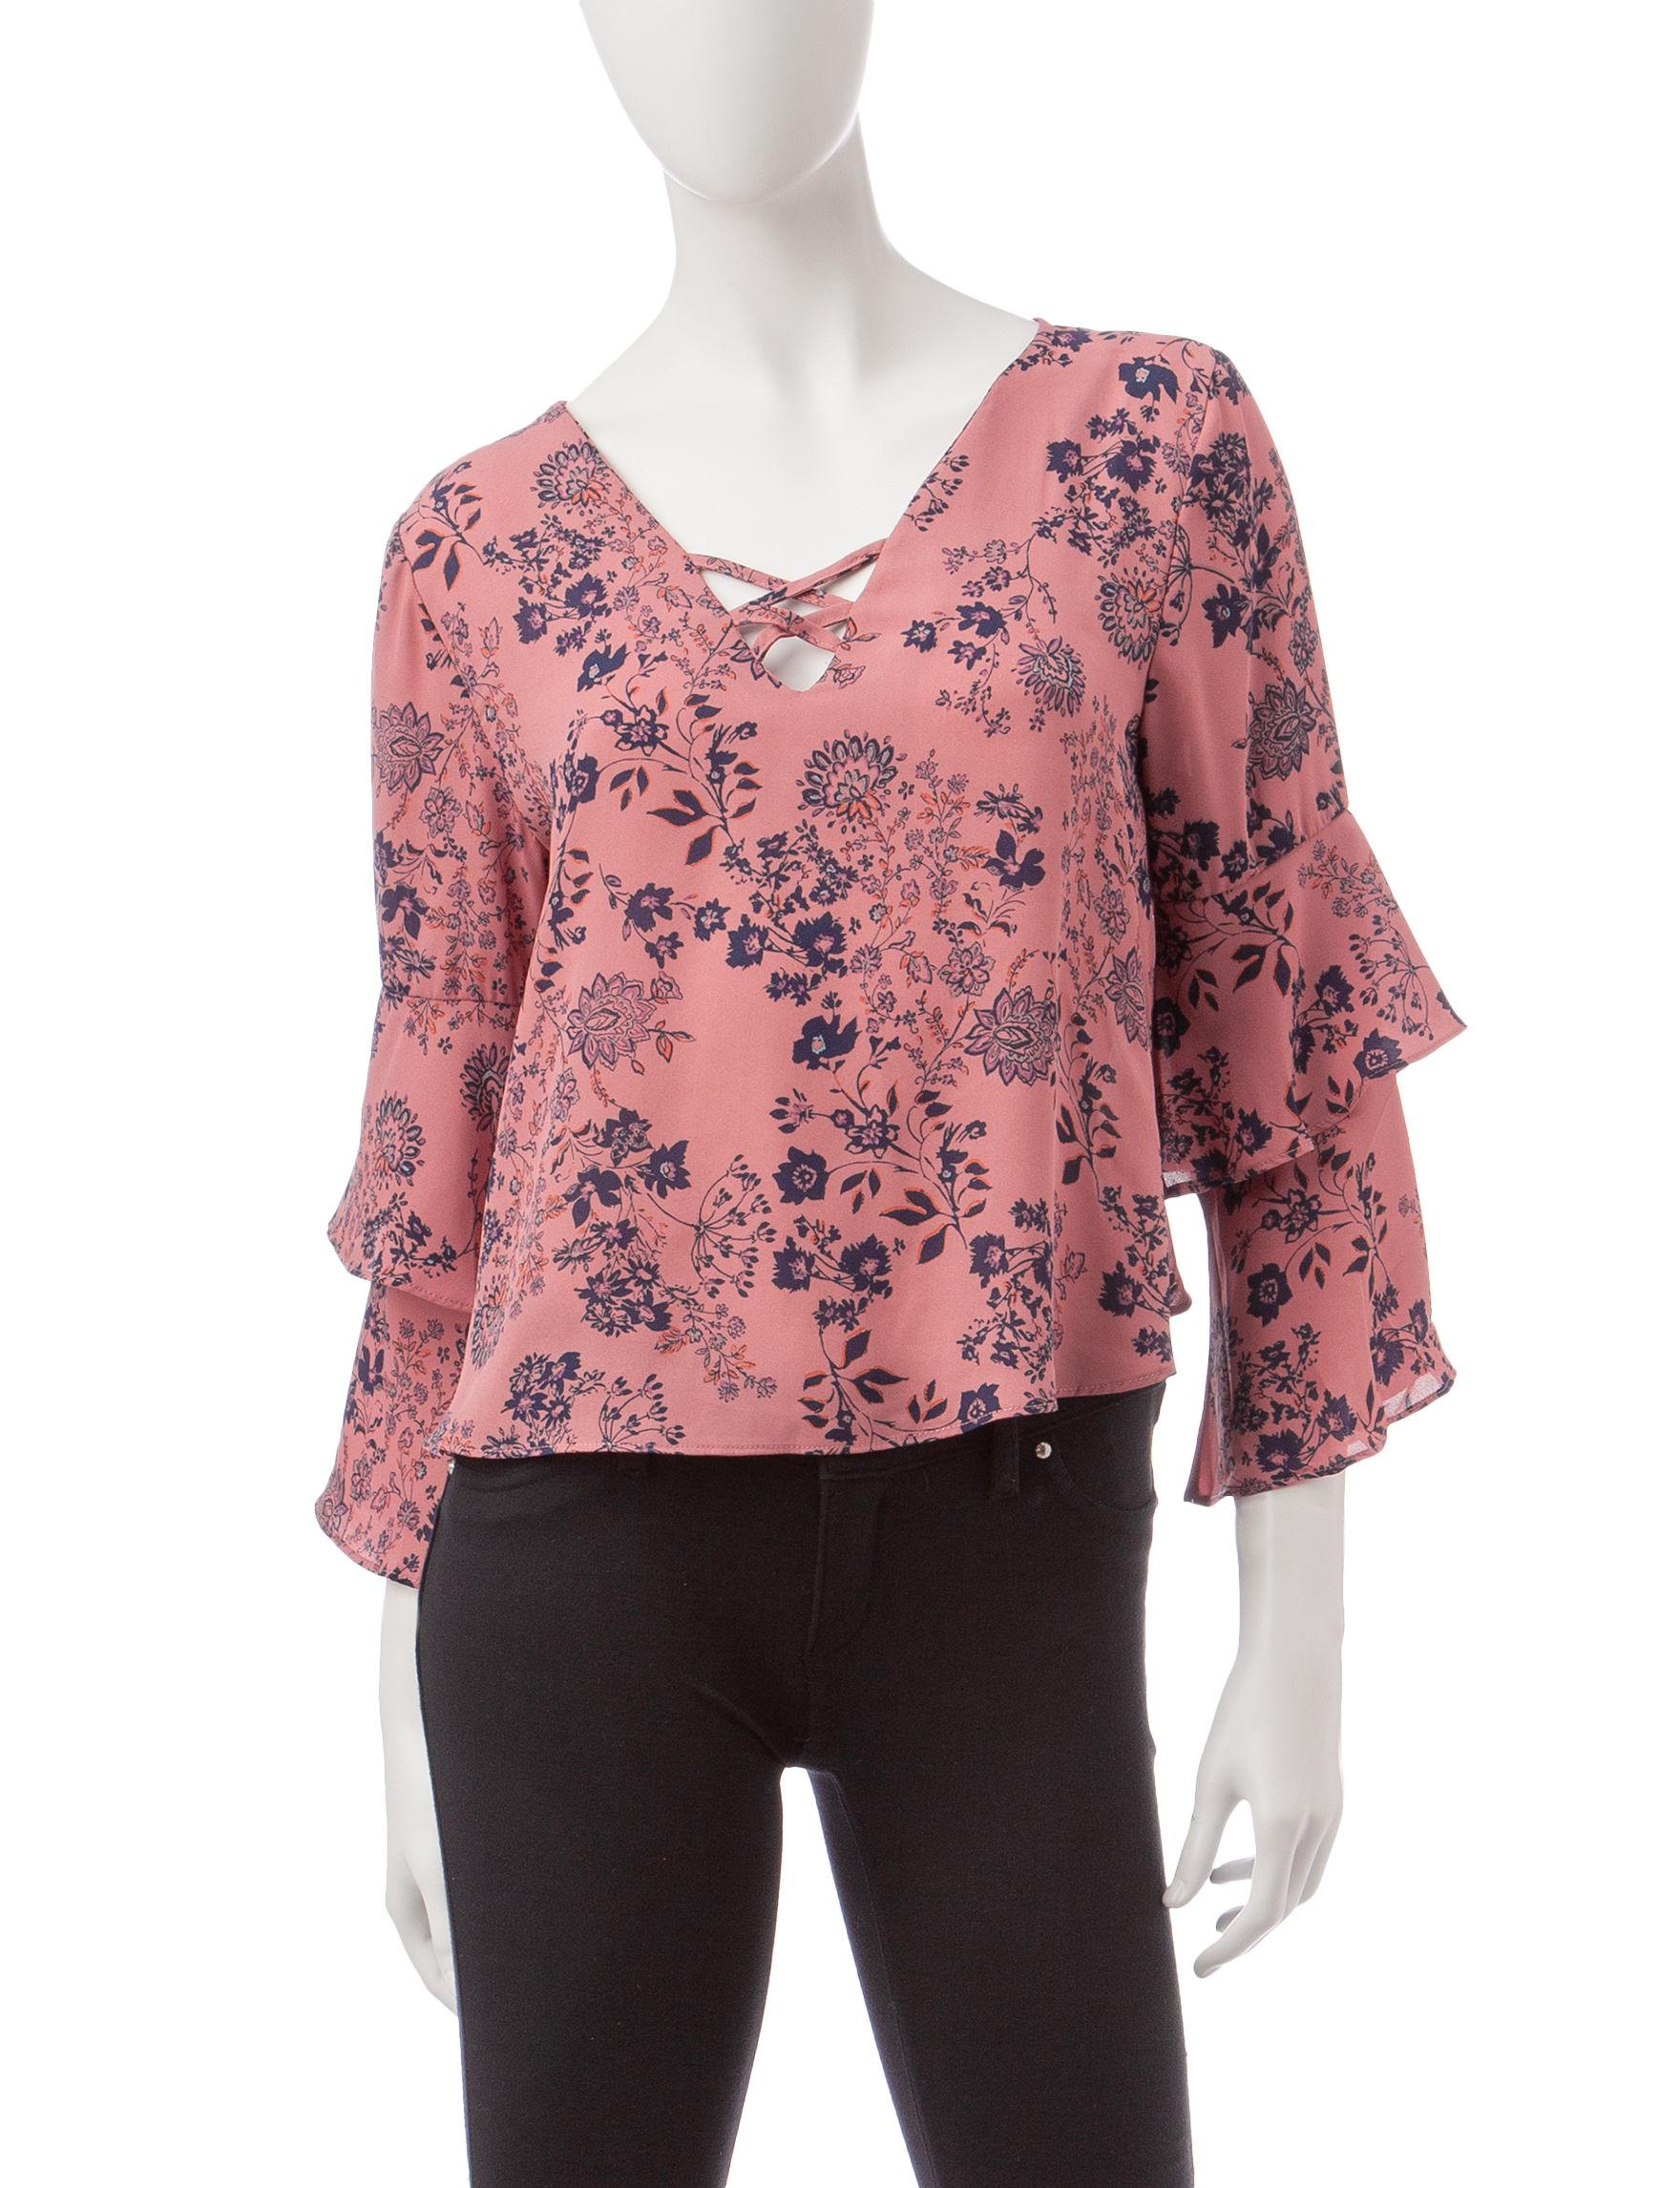 Wishful Park Rose / Black Shirts & Blouses